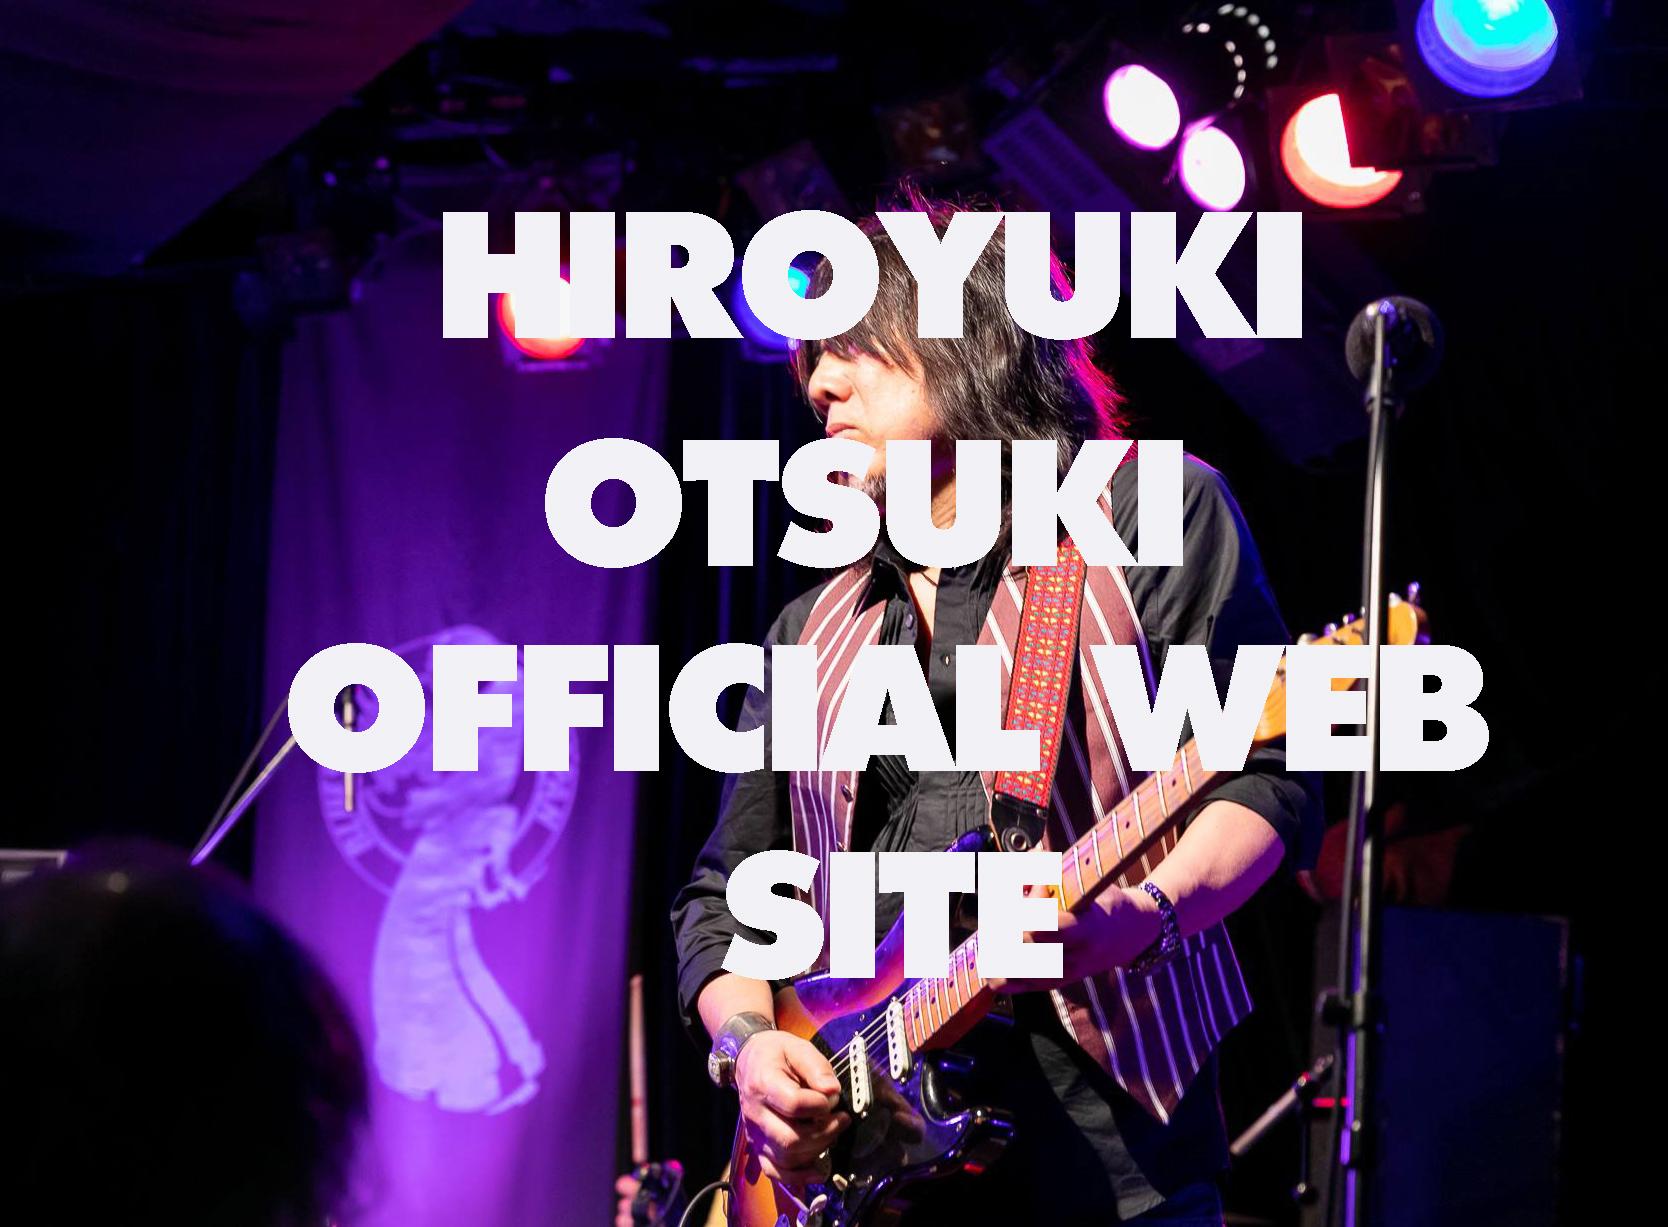 Hiroyukiotsuki official Web site